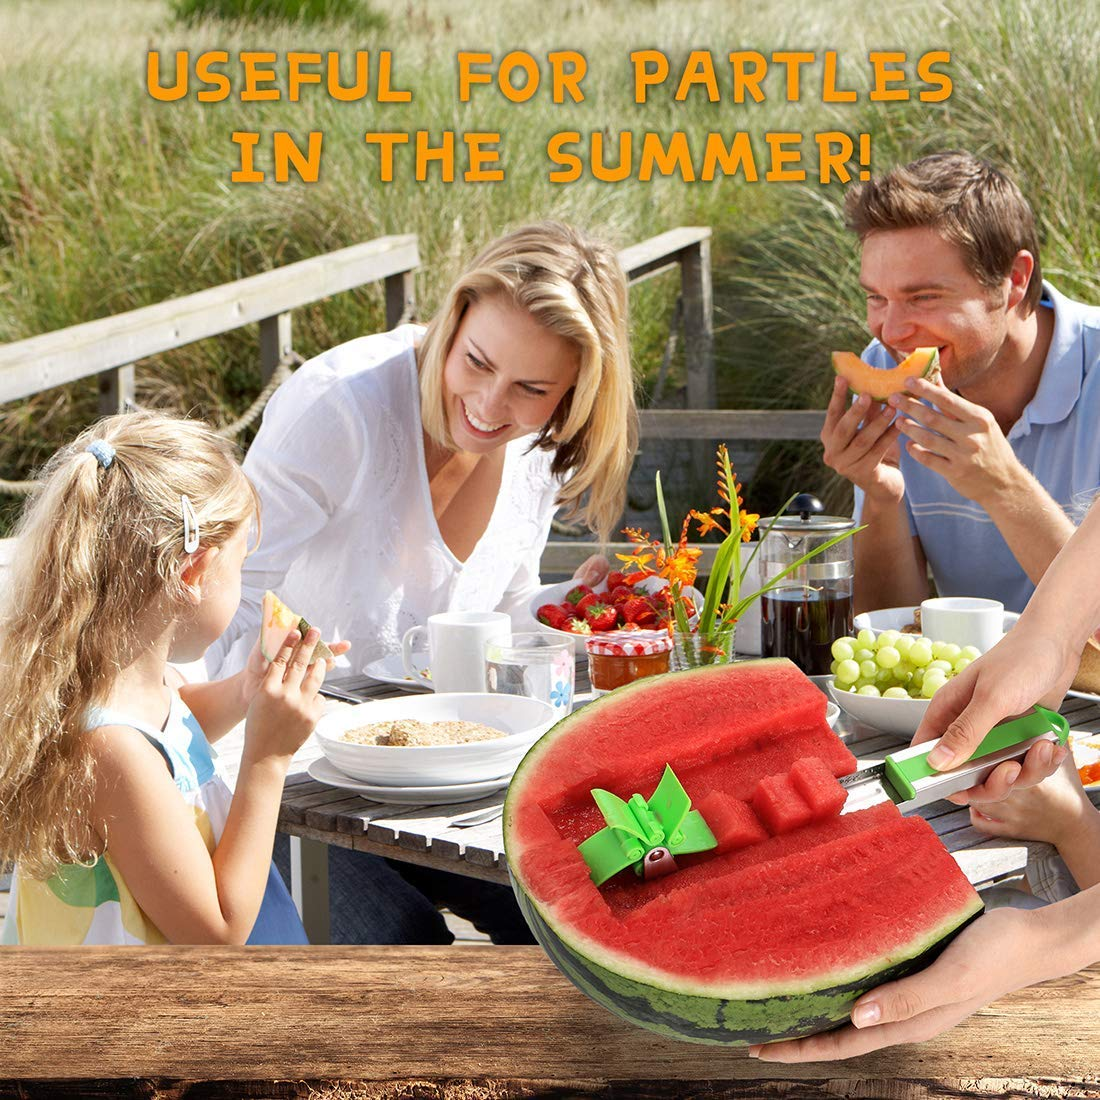 Watermelon Slicer, 2019 Novel Windmill Watermelon Slicer Cutter Tongs Corer Fruit Melon Stainless Steel Tools (green) by YCZTXSJT